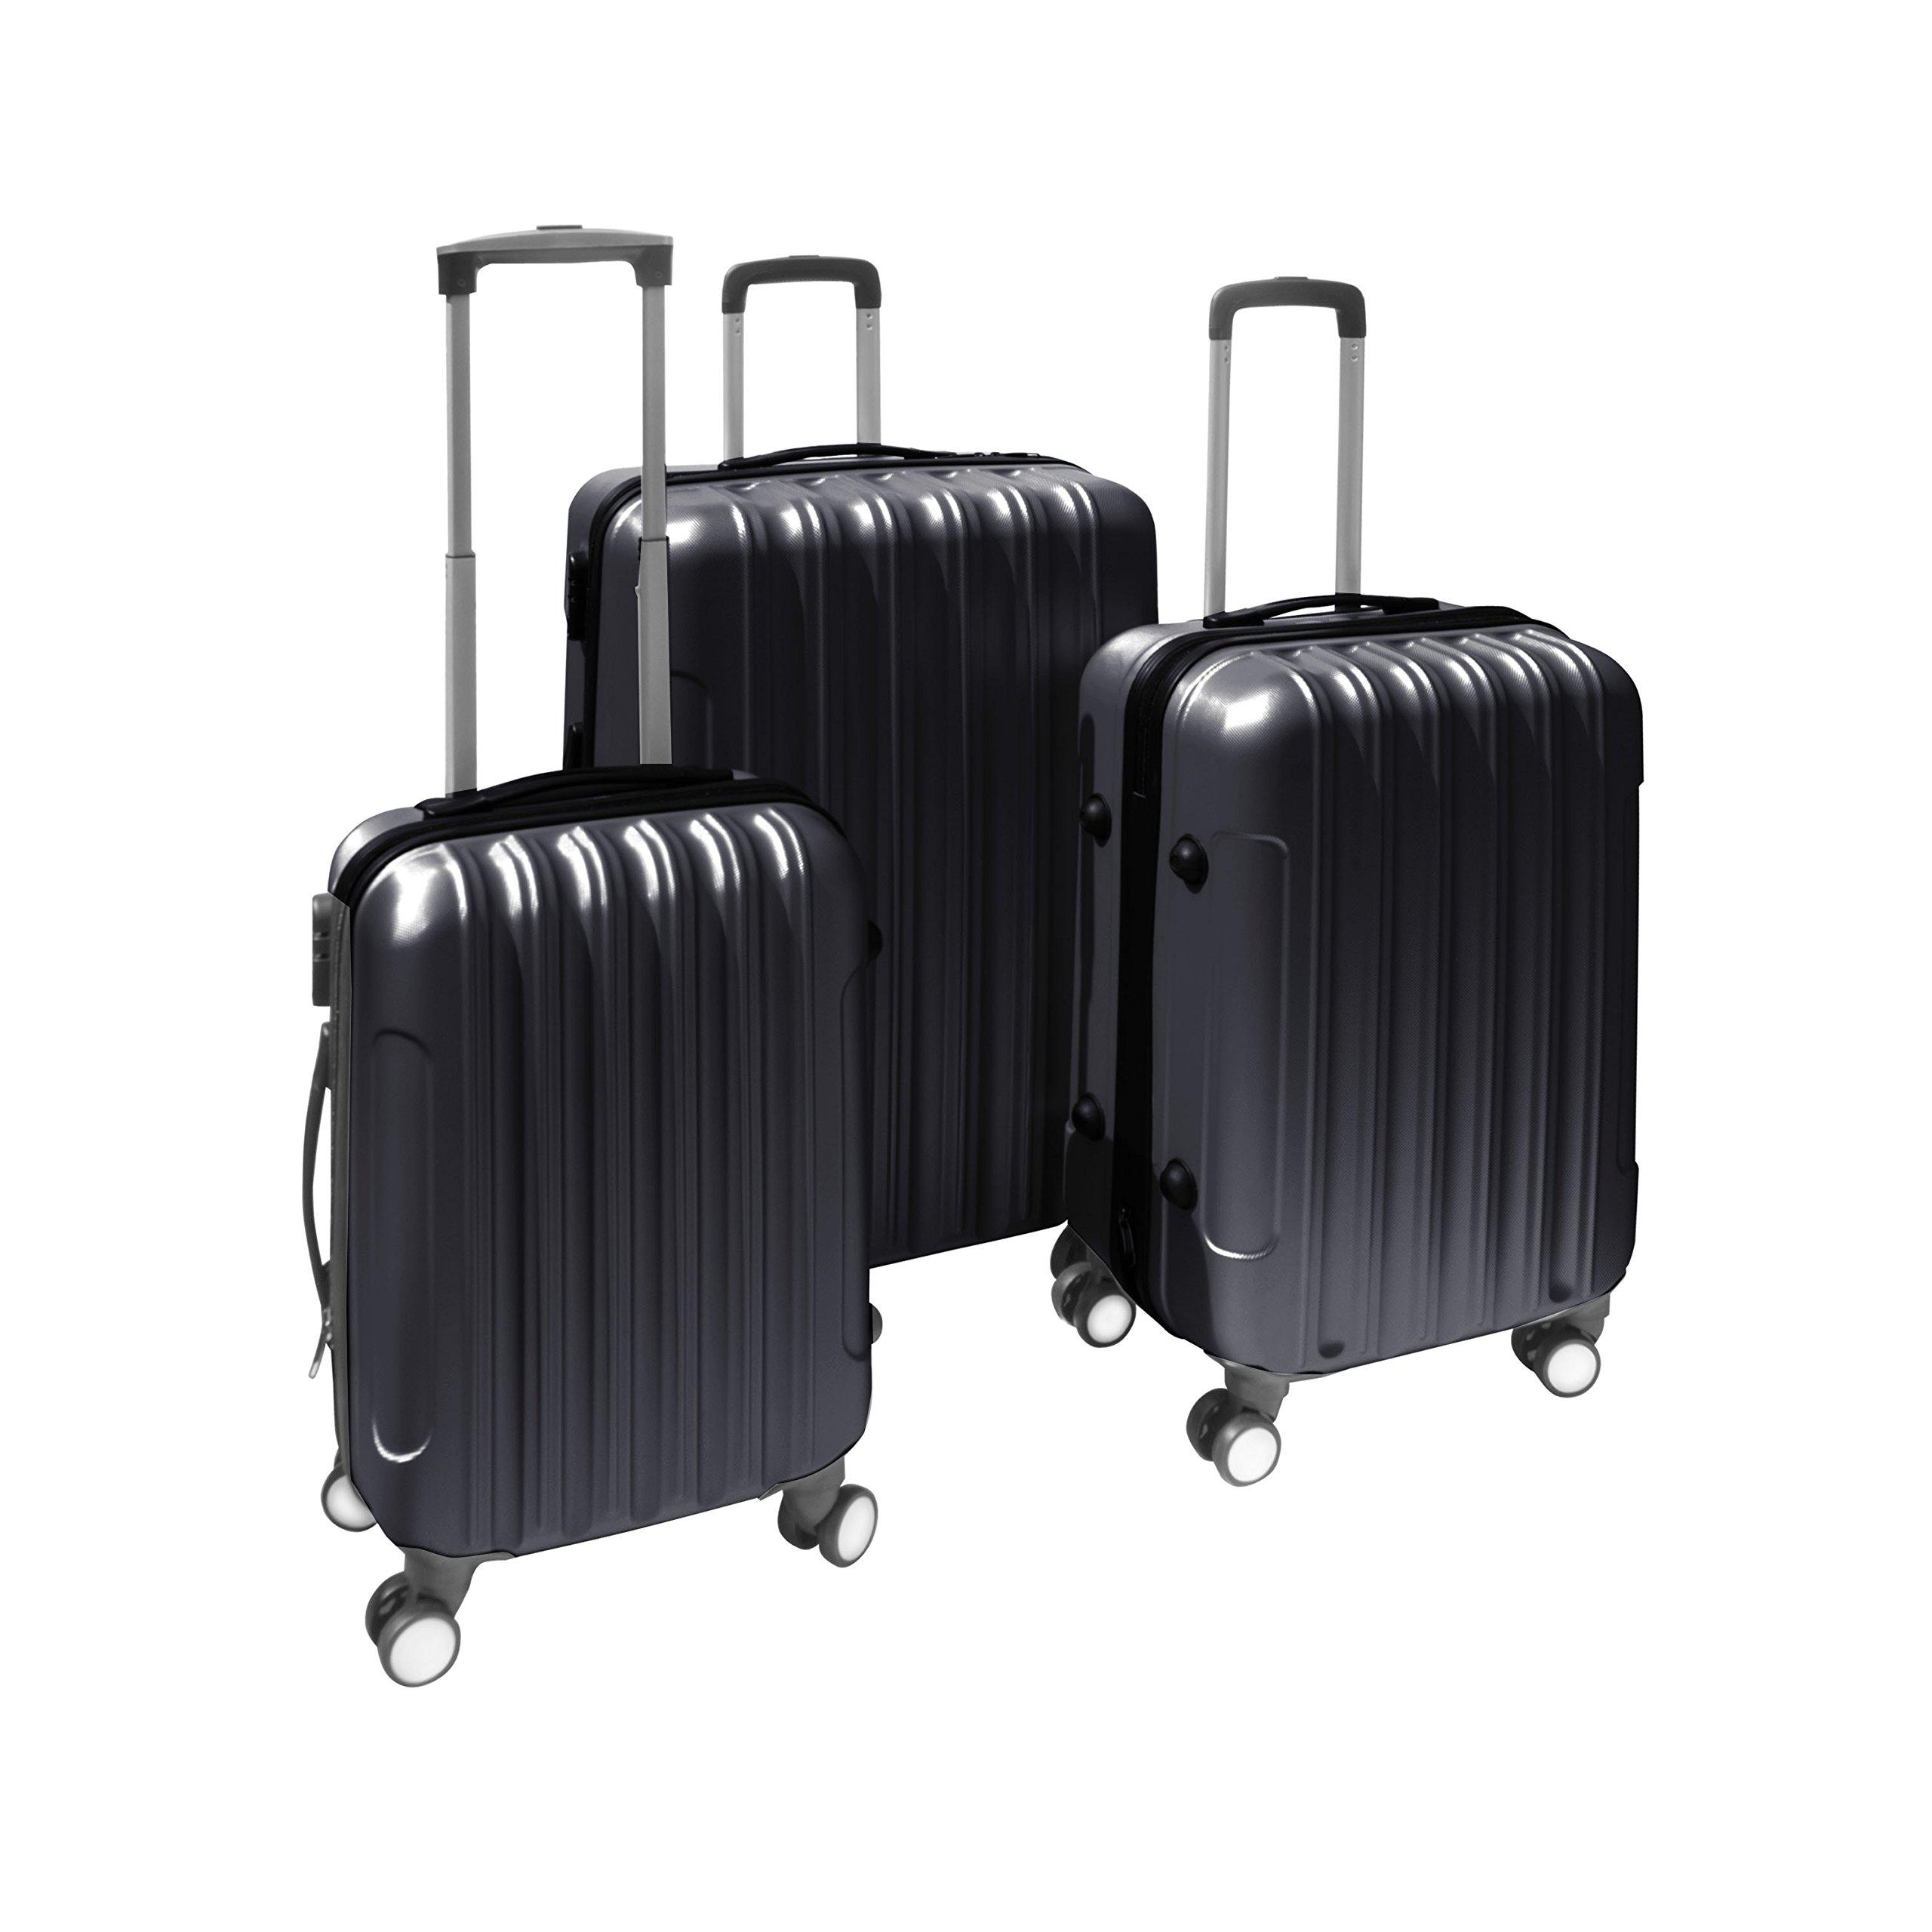 ALEKO 3 Piece Luggage Travel Bag Set ABS Suitcase With Lock, Black Color